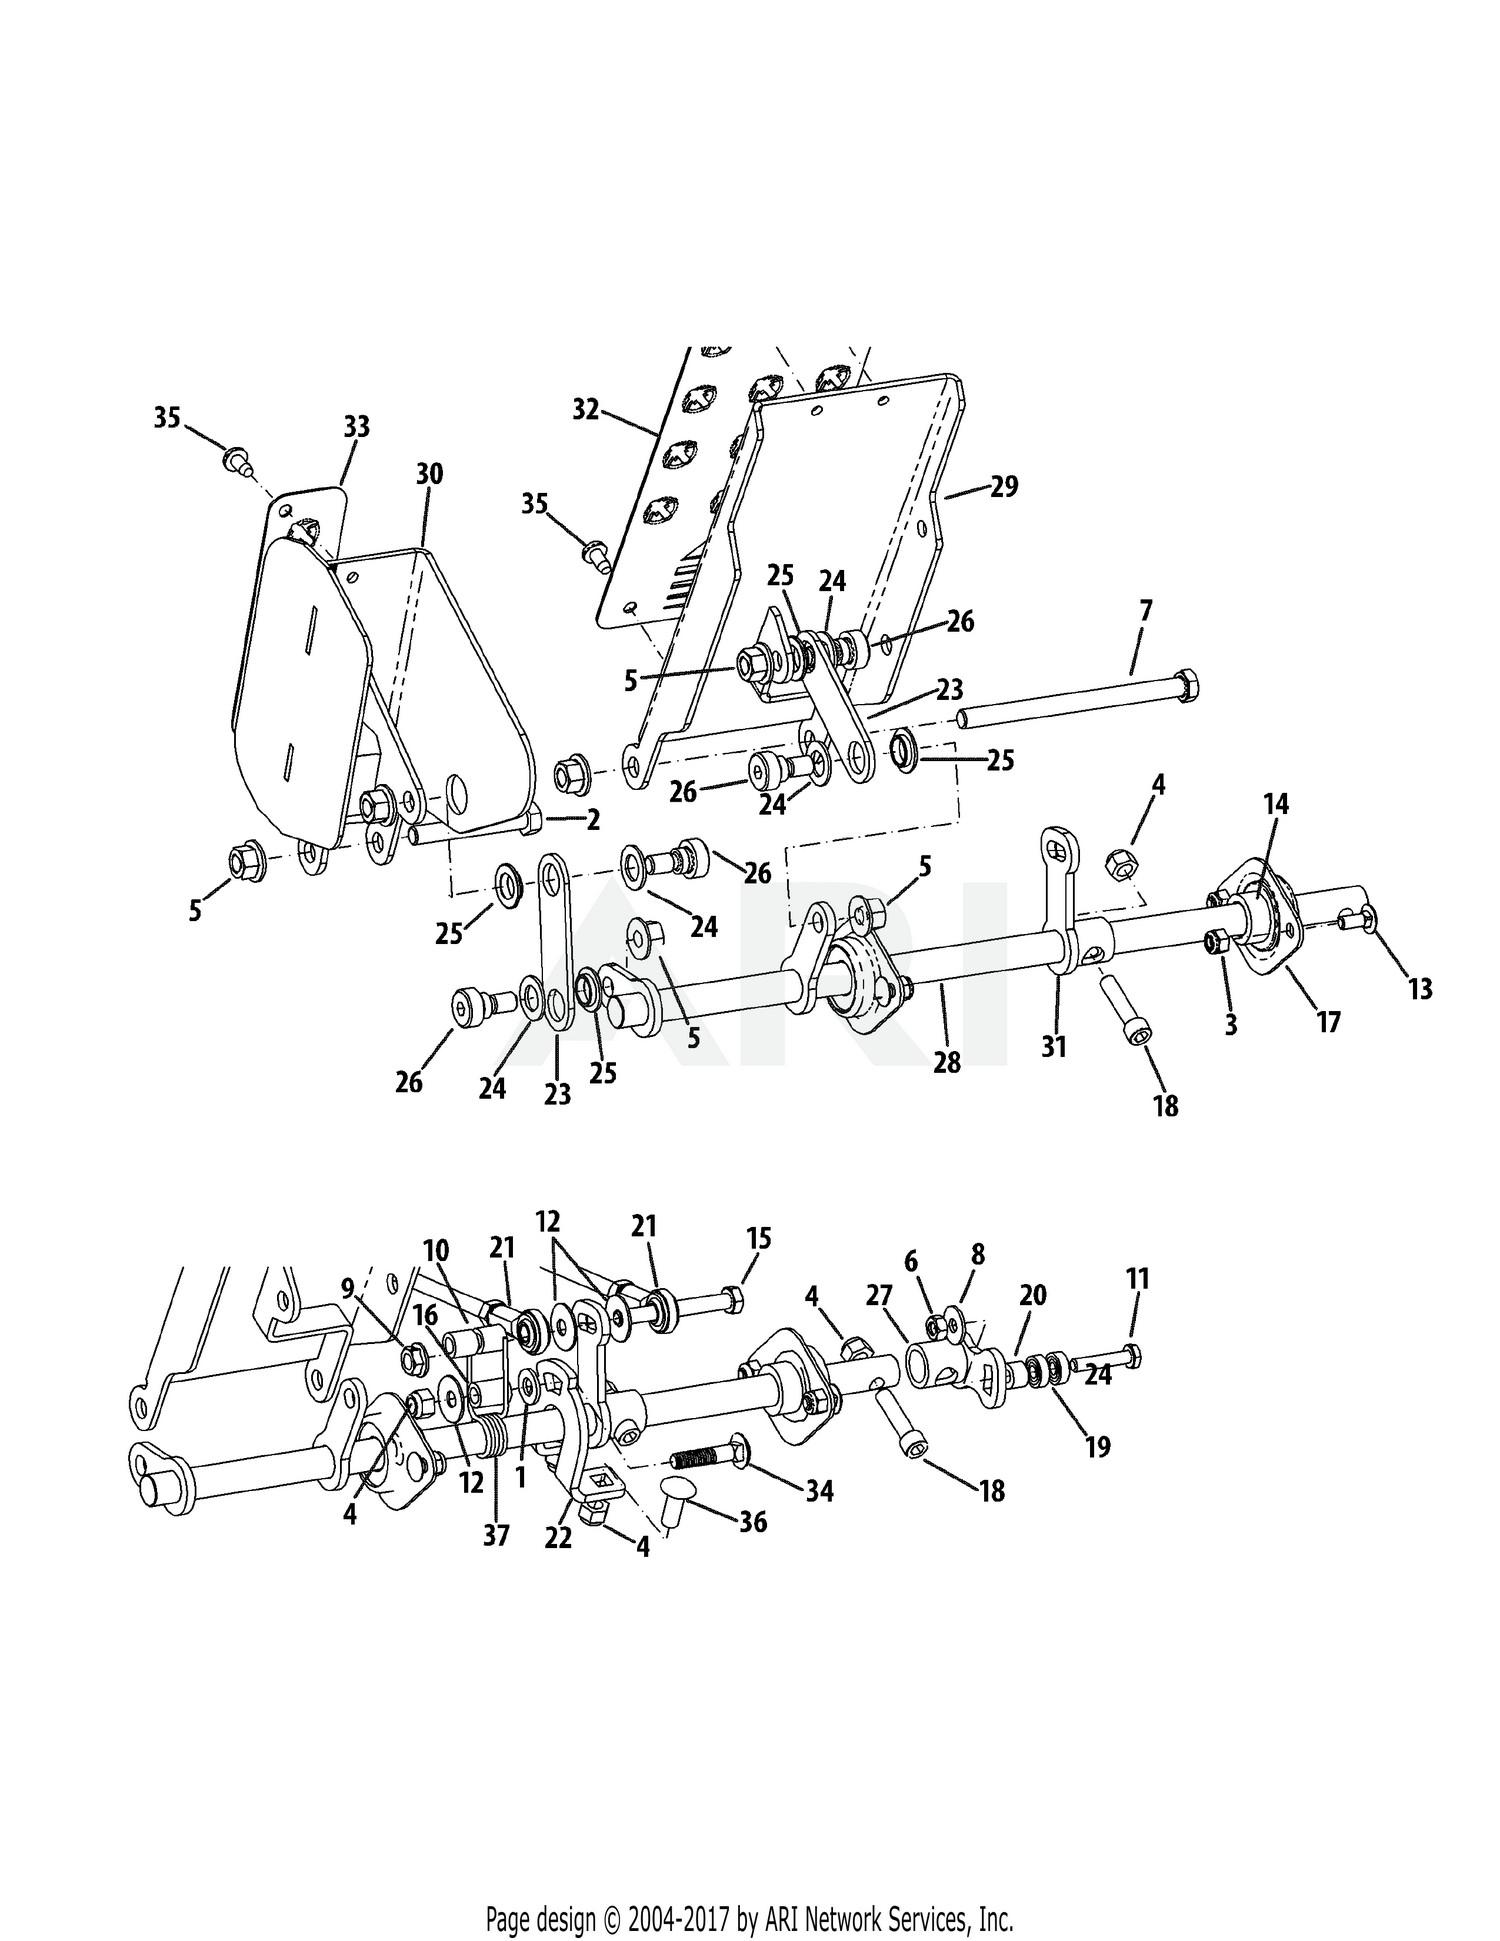 hight resolution of wiring diagram for cub cadet volunteer wiring diagrams cushman haulster wiring diagram cub cadet volunteer wiring diagram